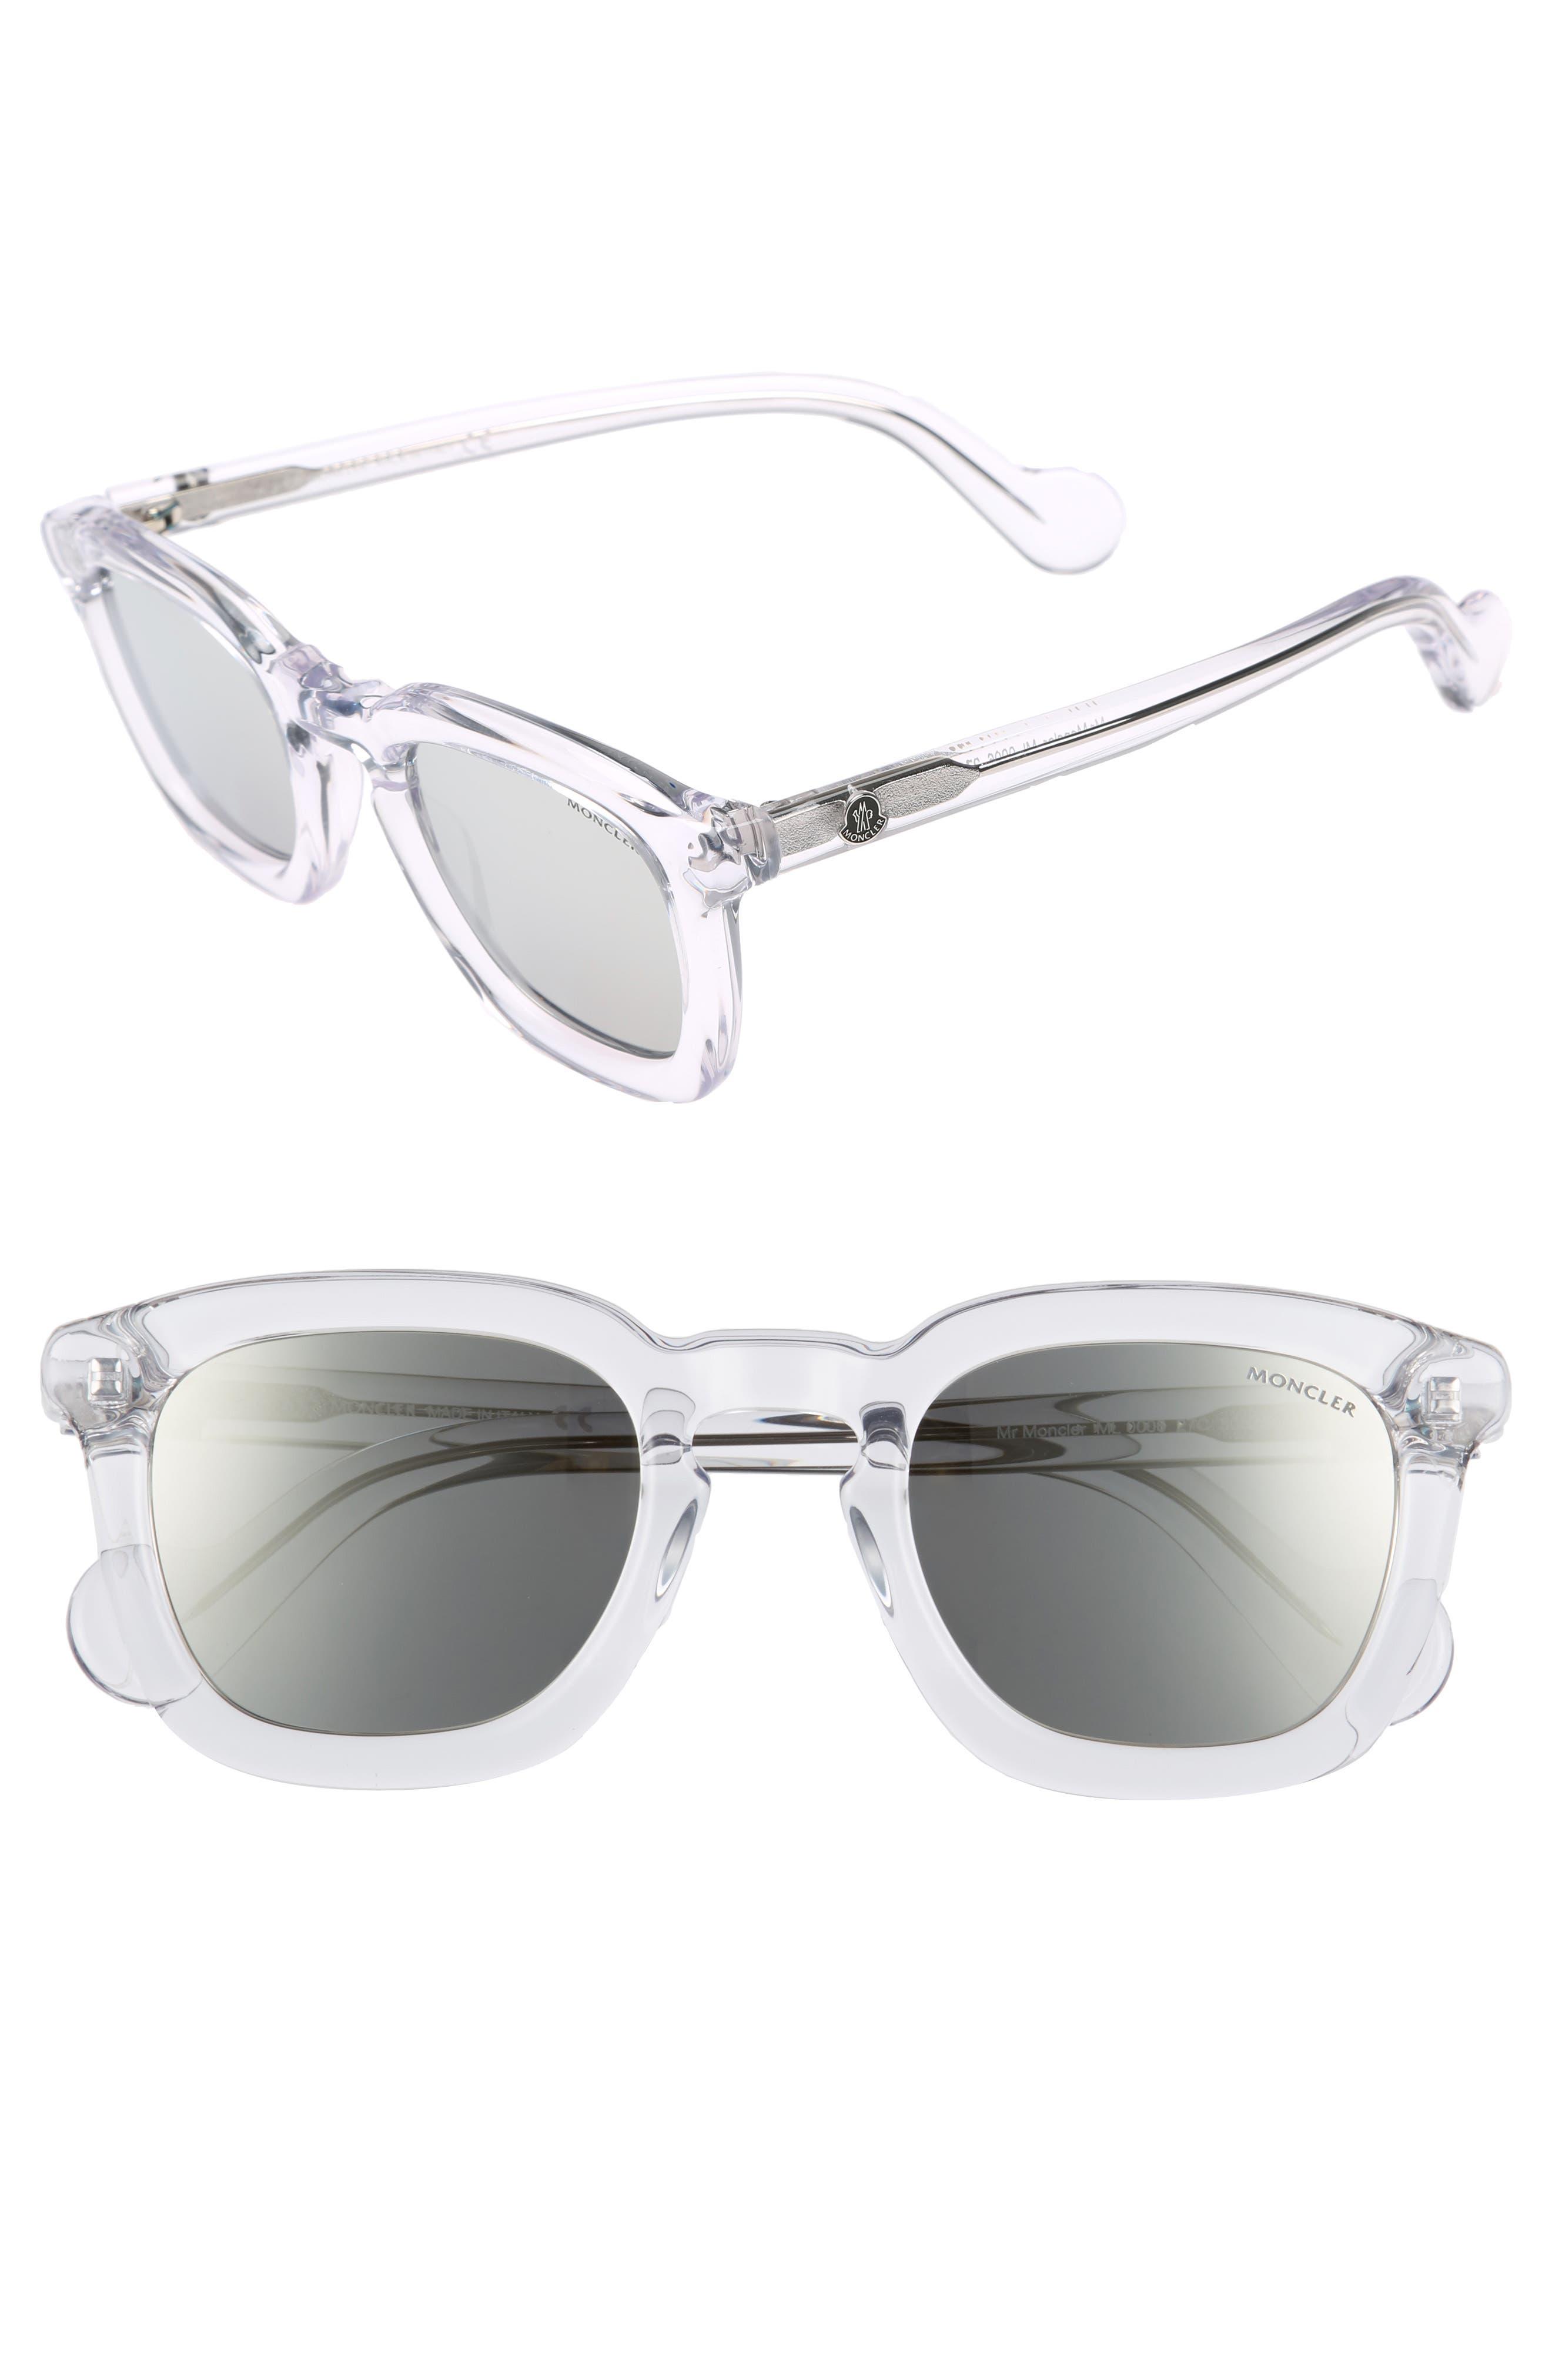 50mm Square Sunglasses,                             Main thumbnail 3, color,